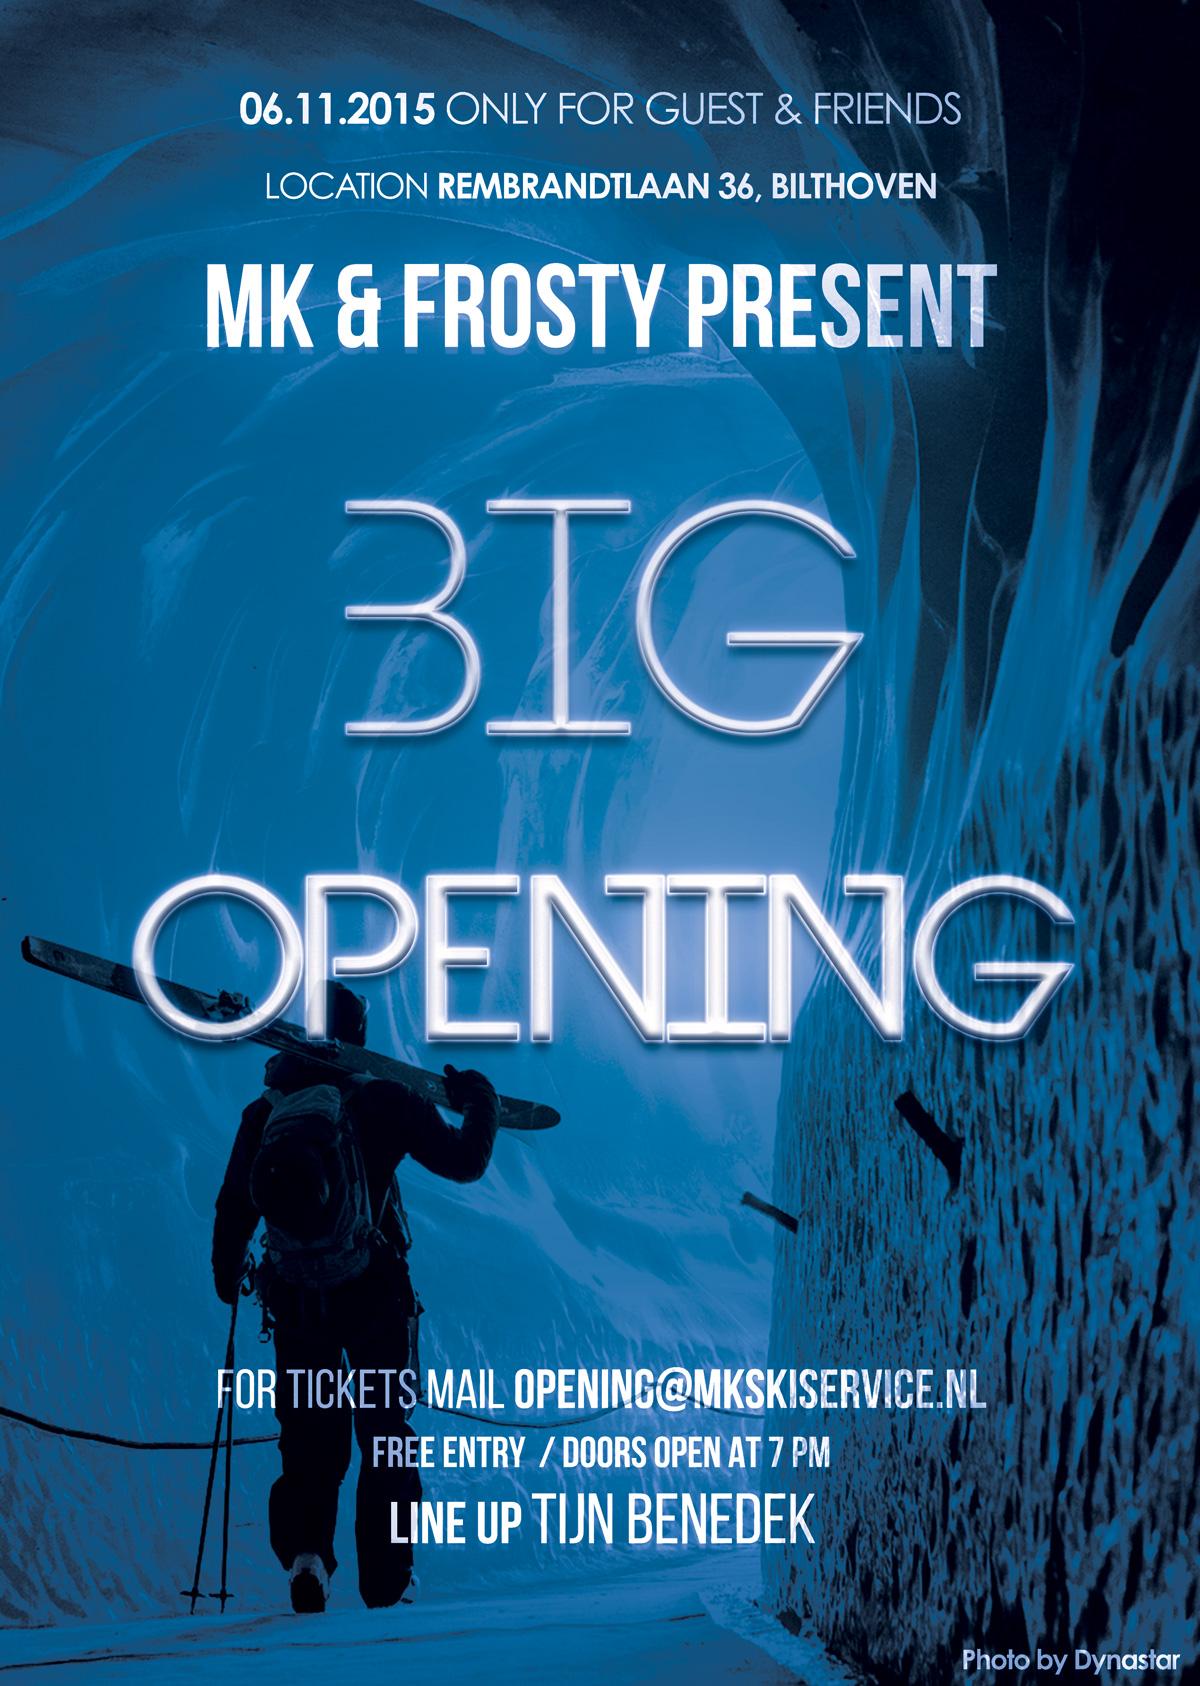 MK & Frosty BIG OPENING